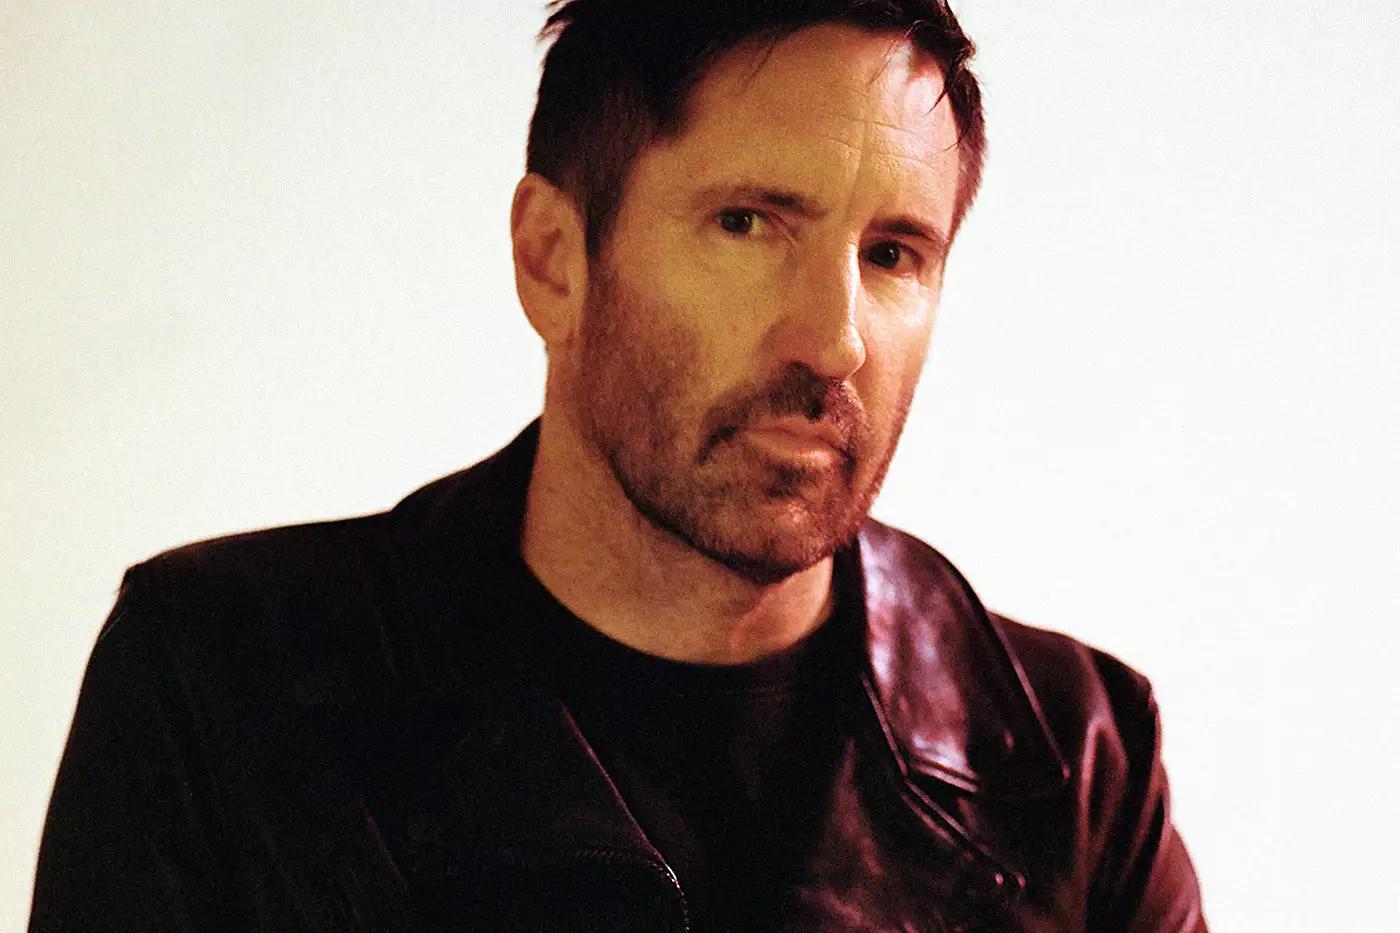 A photograph of Trent Reznor